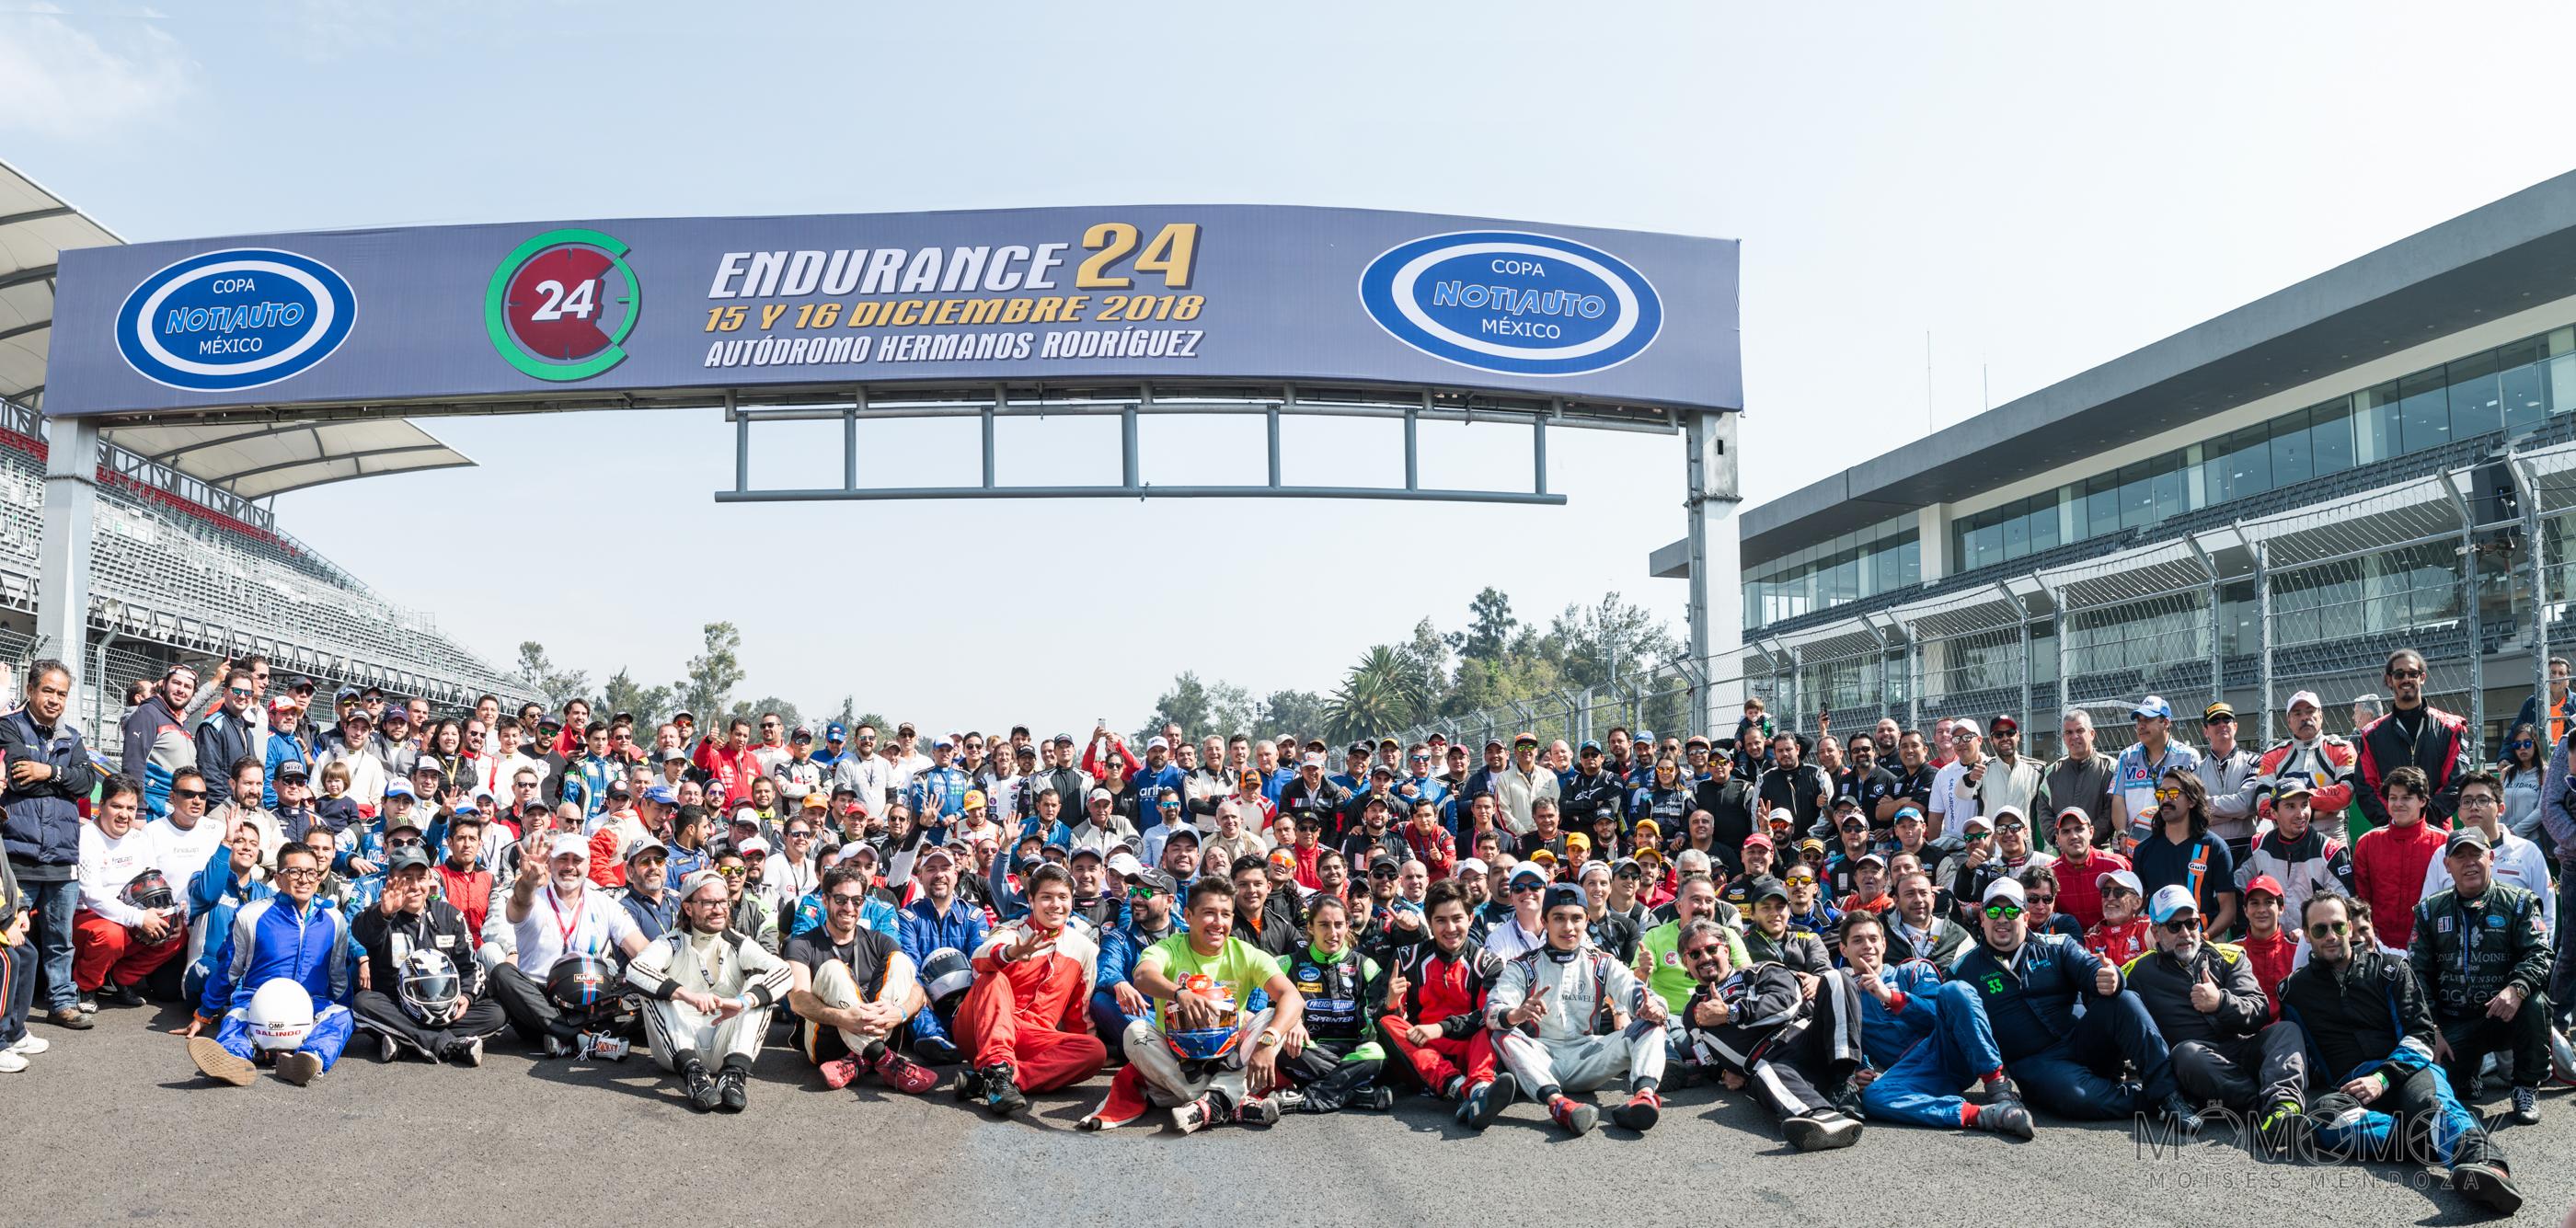 Endurance 24 2018